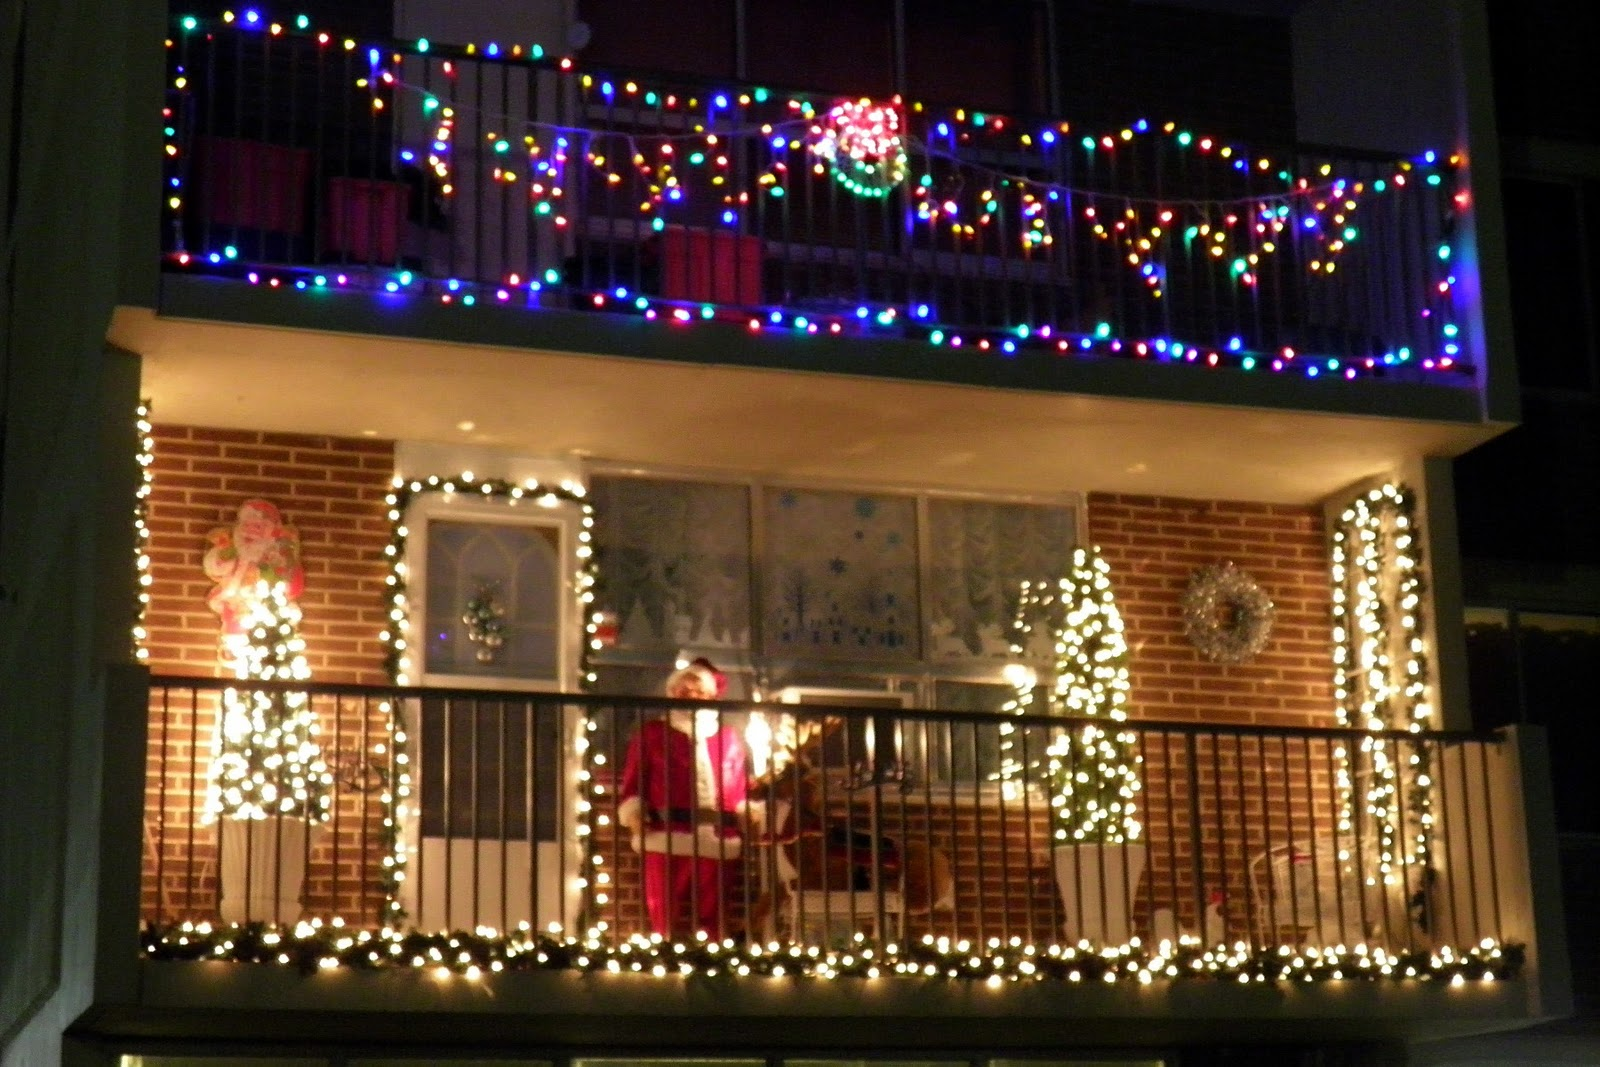 White Oaks Community: It's beginning to look a lot like ...